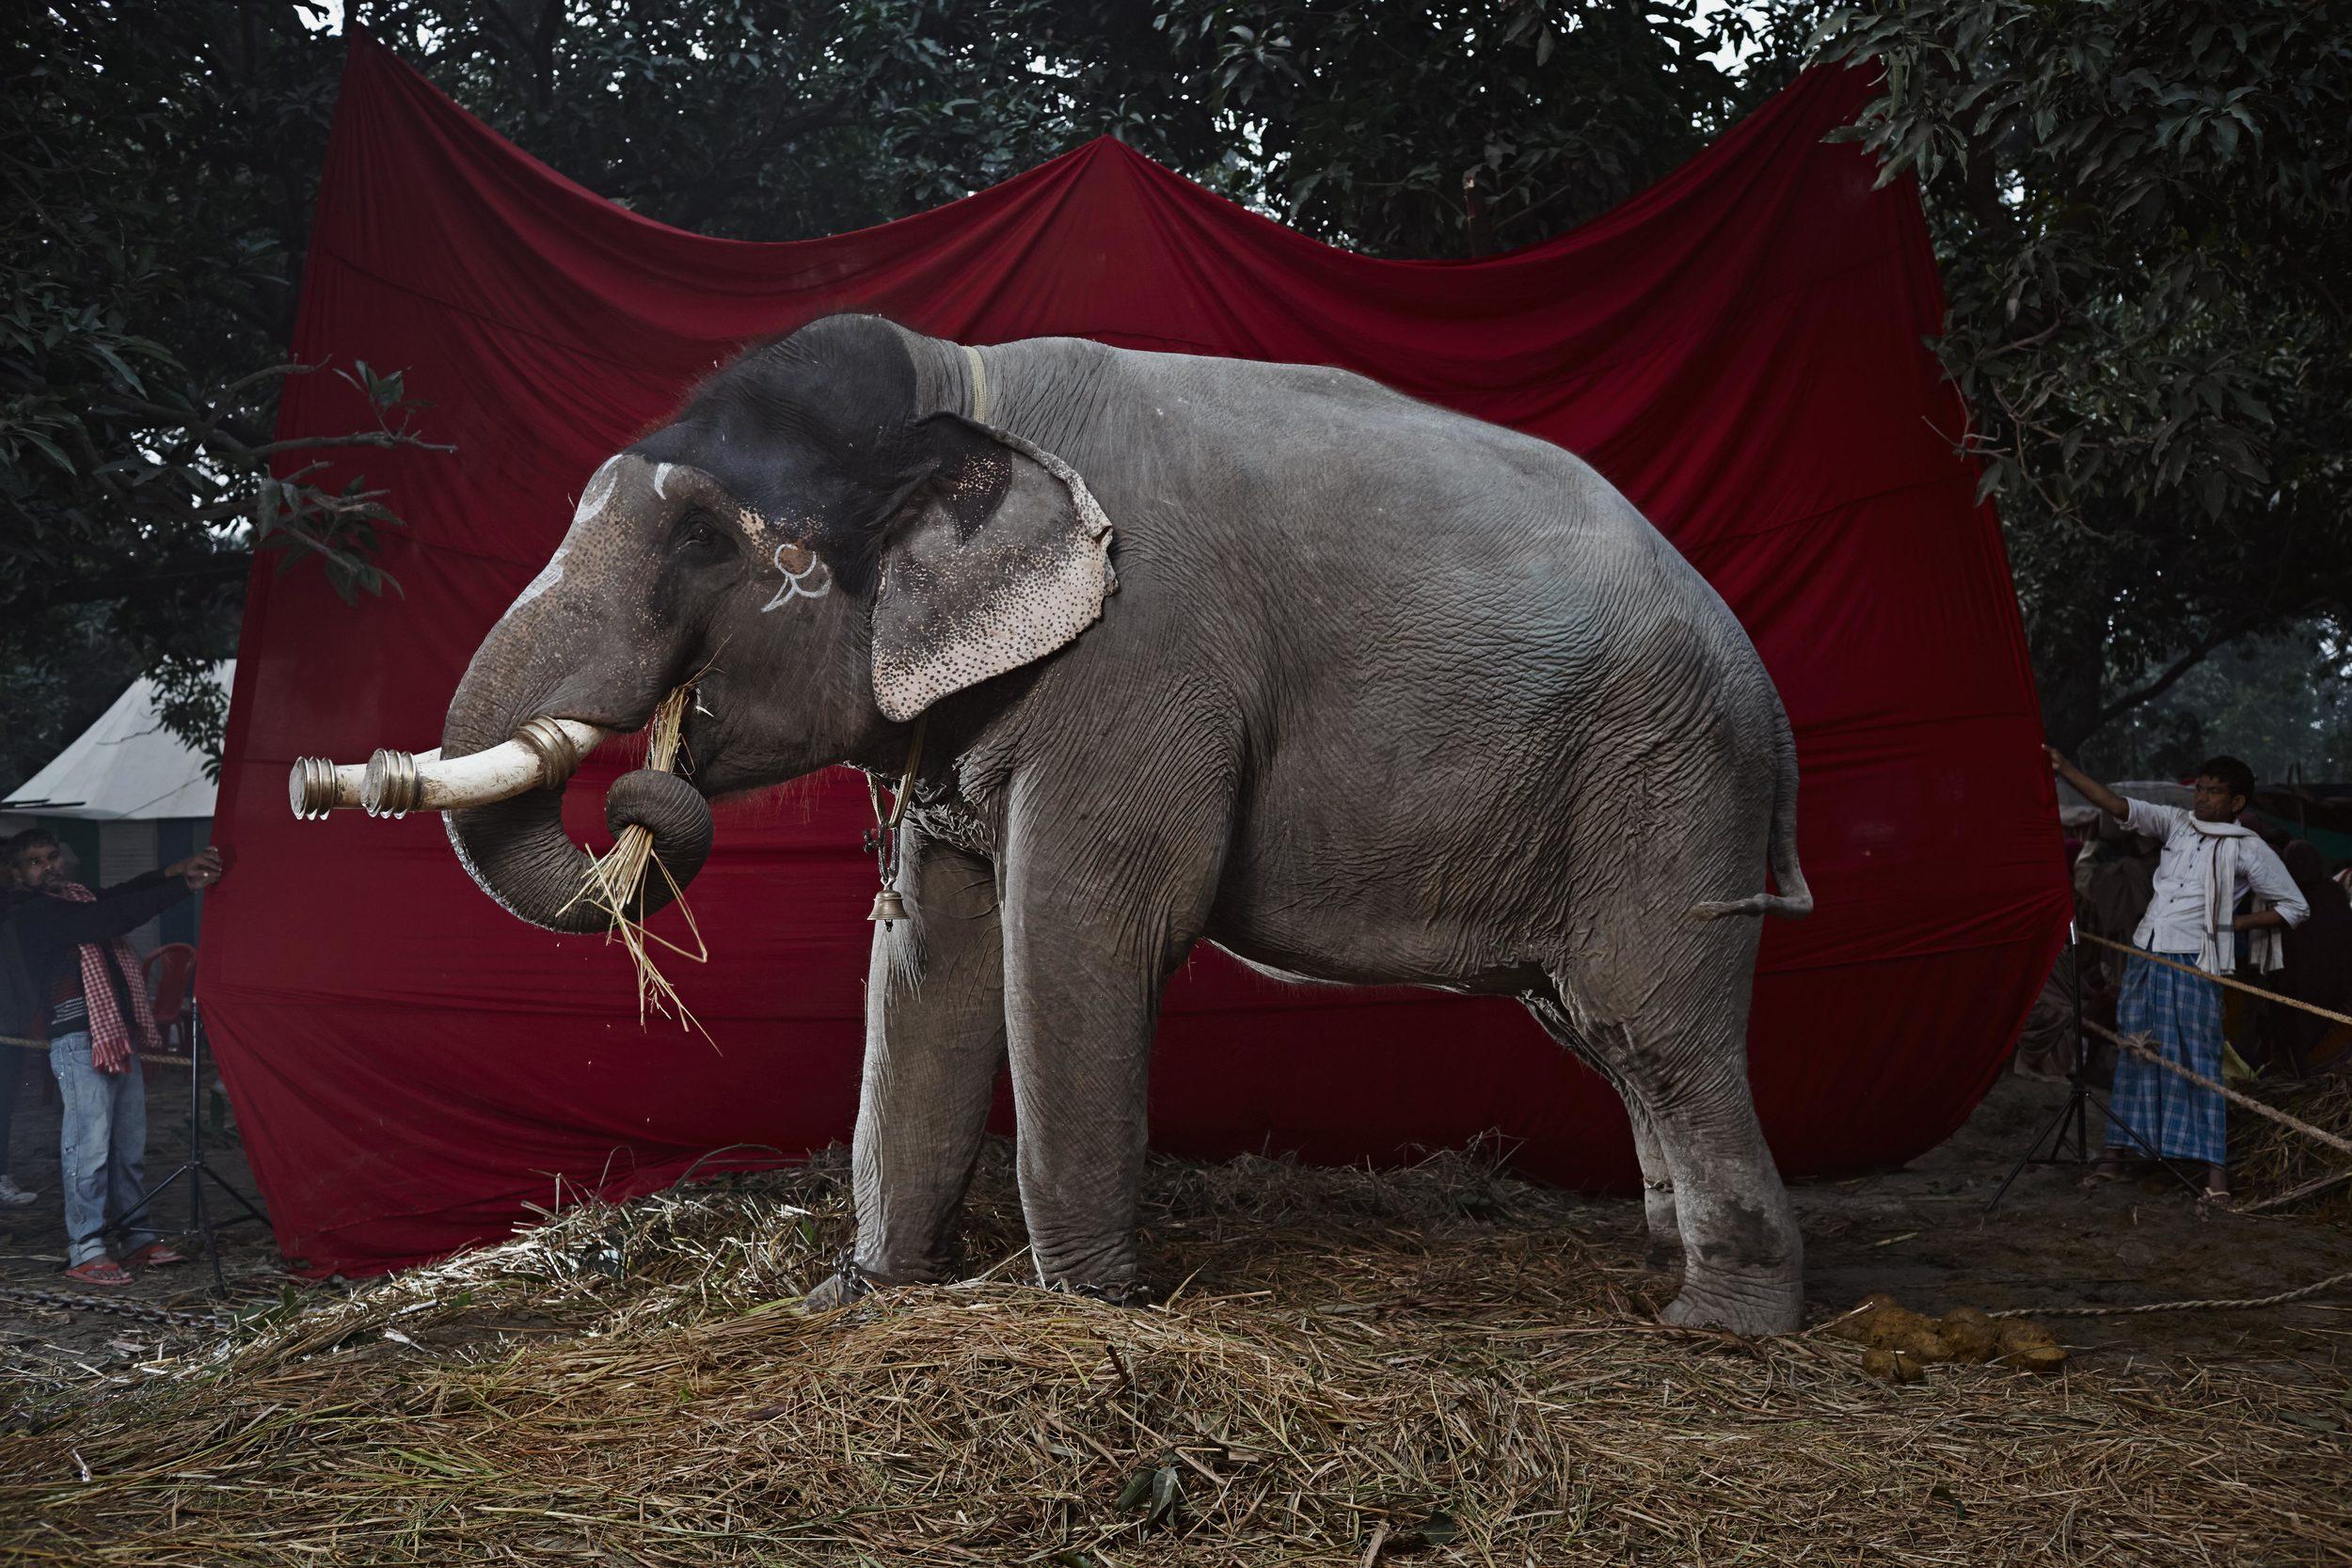 Elephant_2_4_B6C7005.jpg